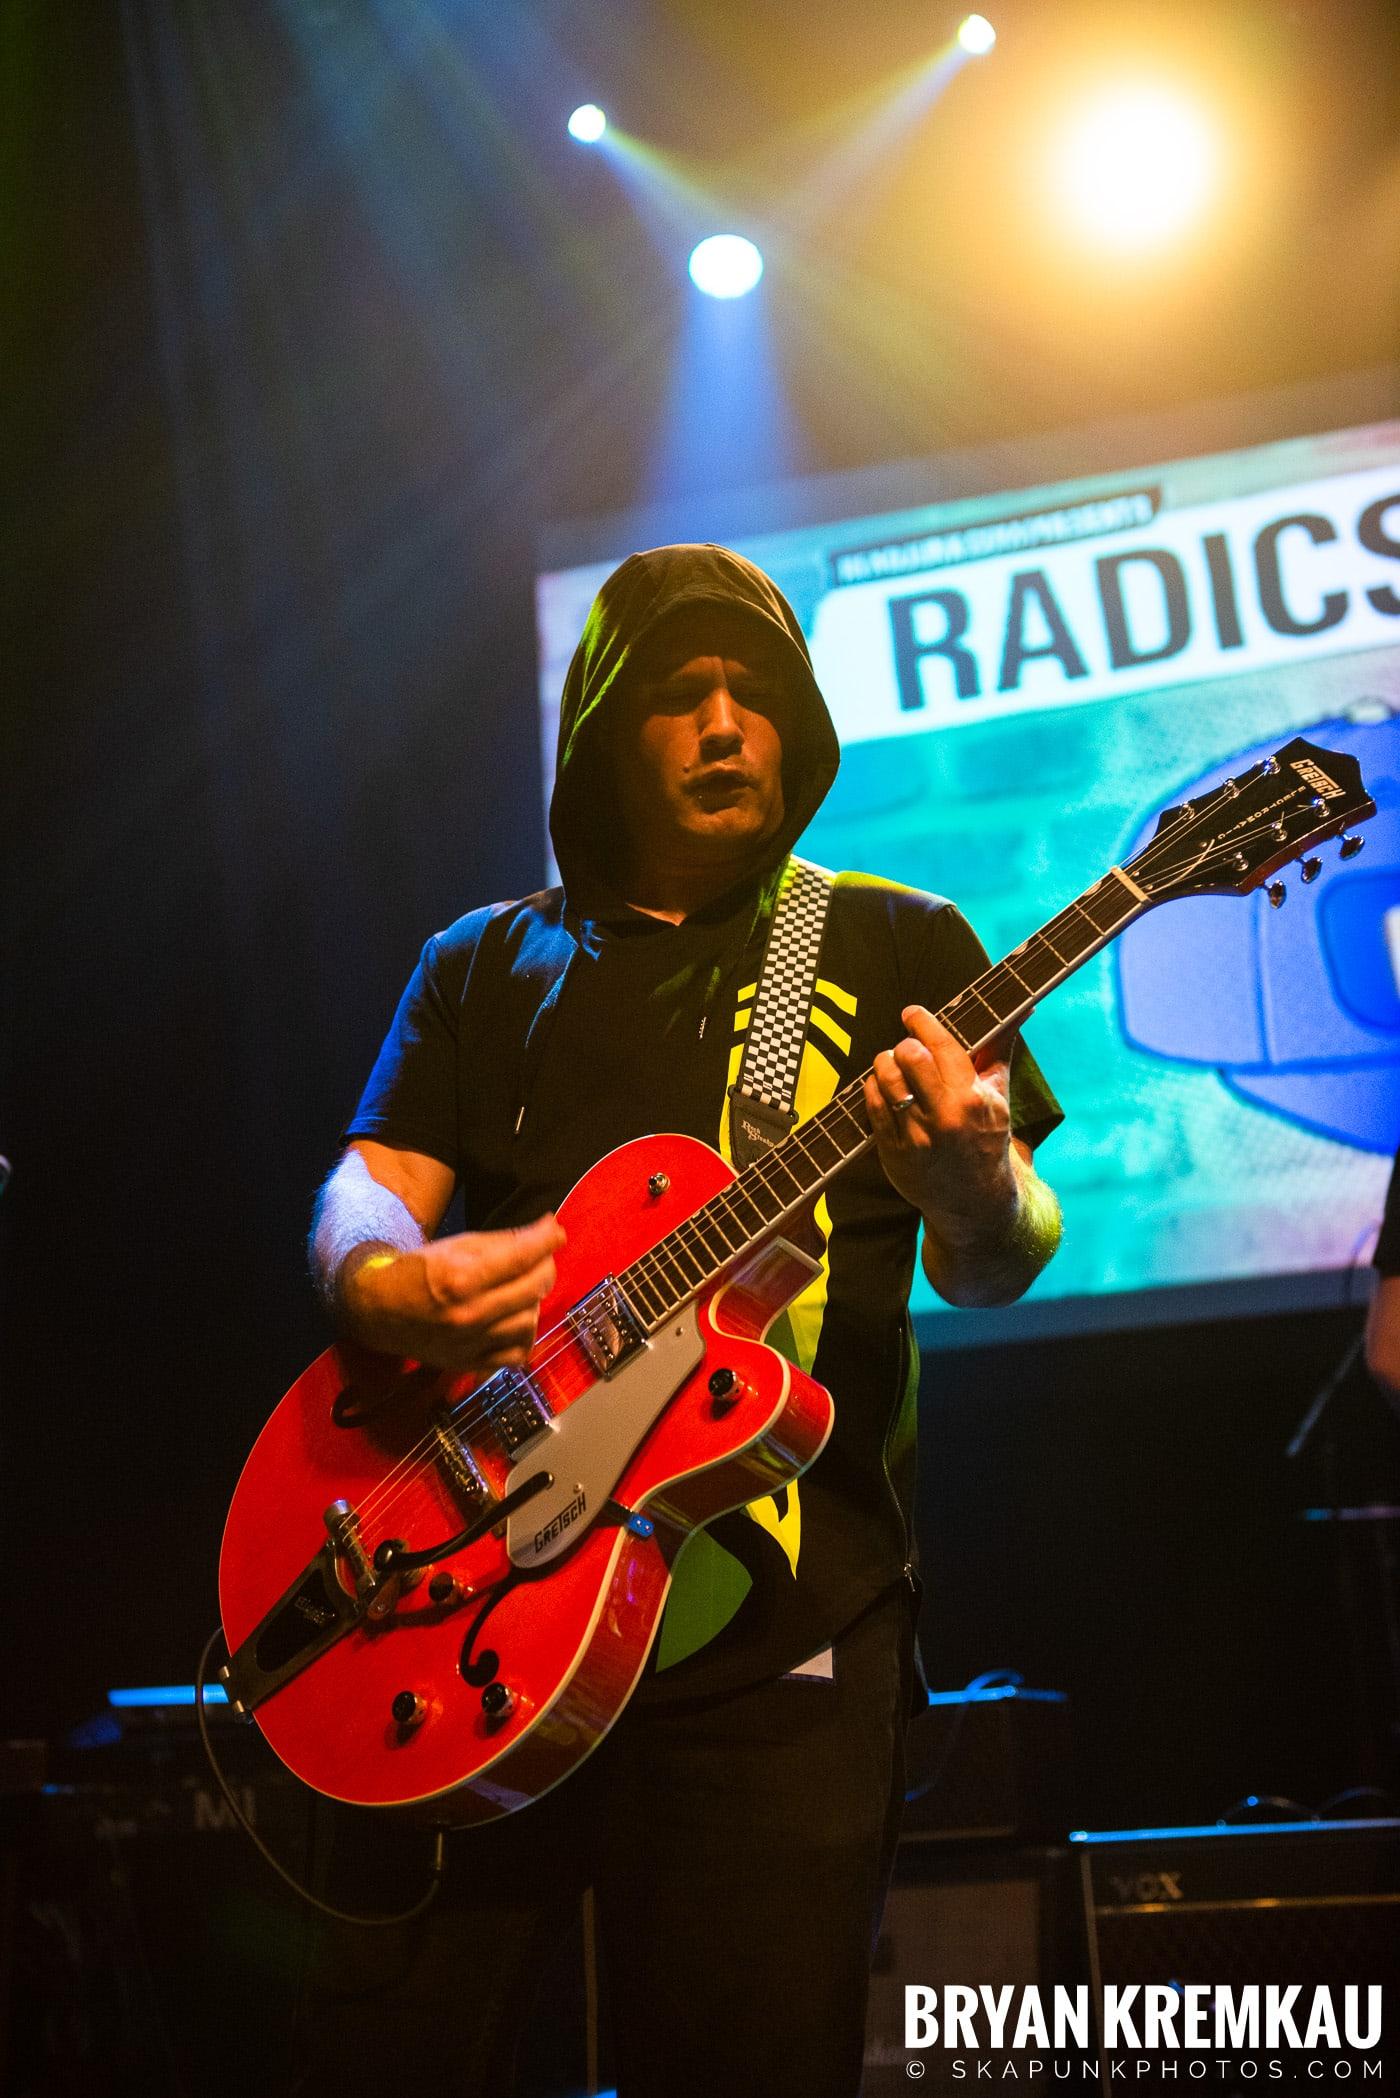 Sgt. Scagnetti @ Radicsfest, Gramercy Theatre, NYC - 7.19.19 (42)